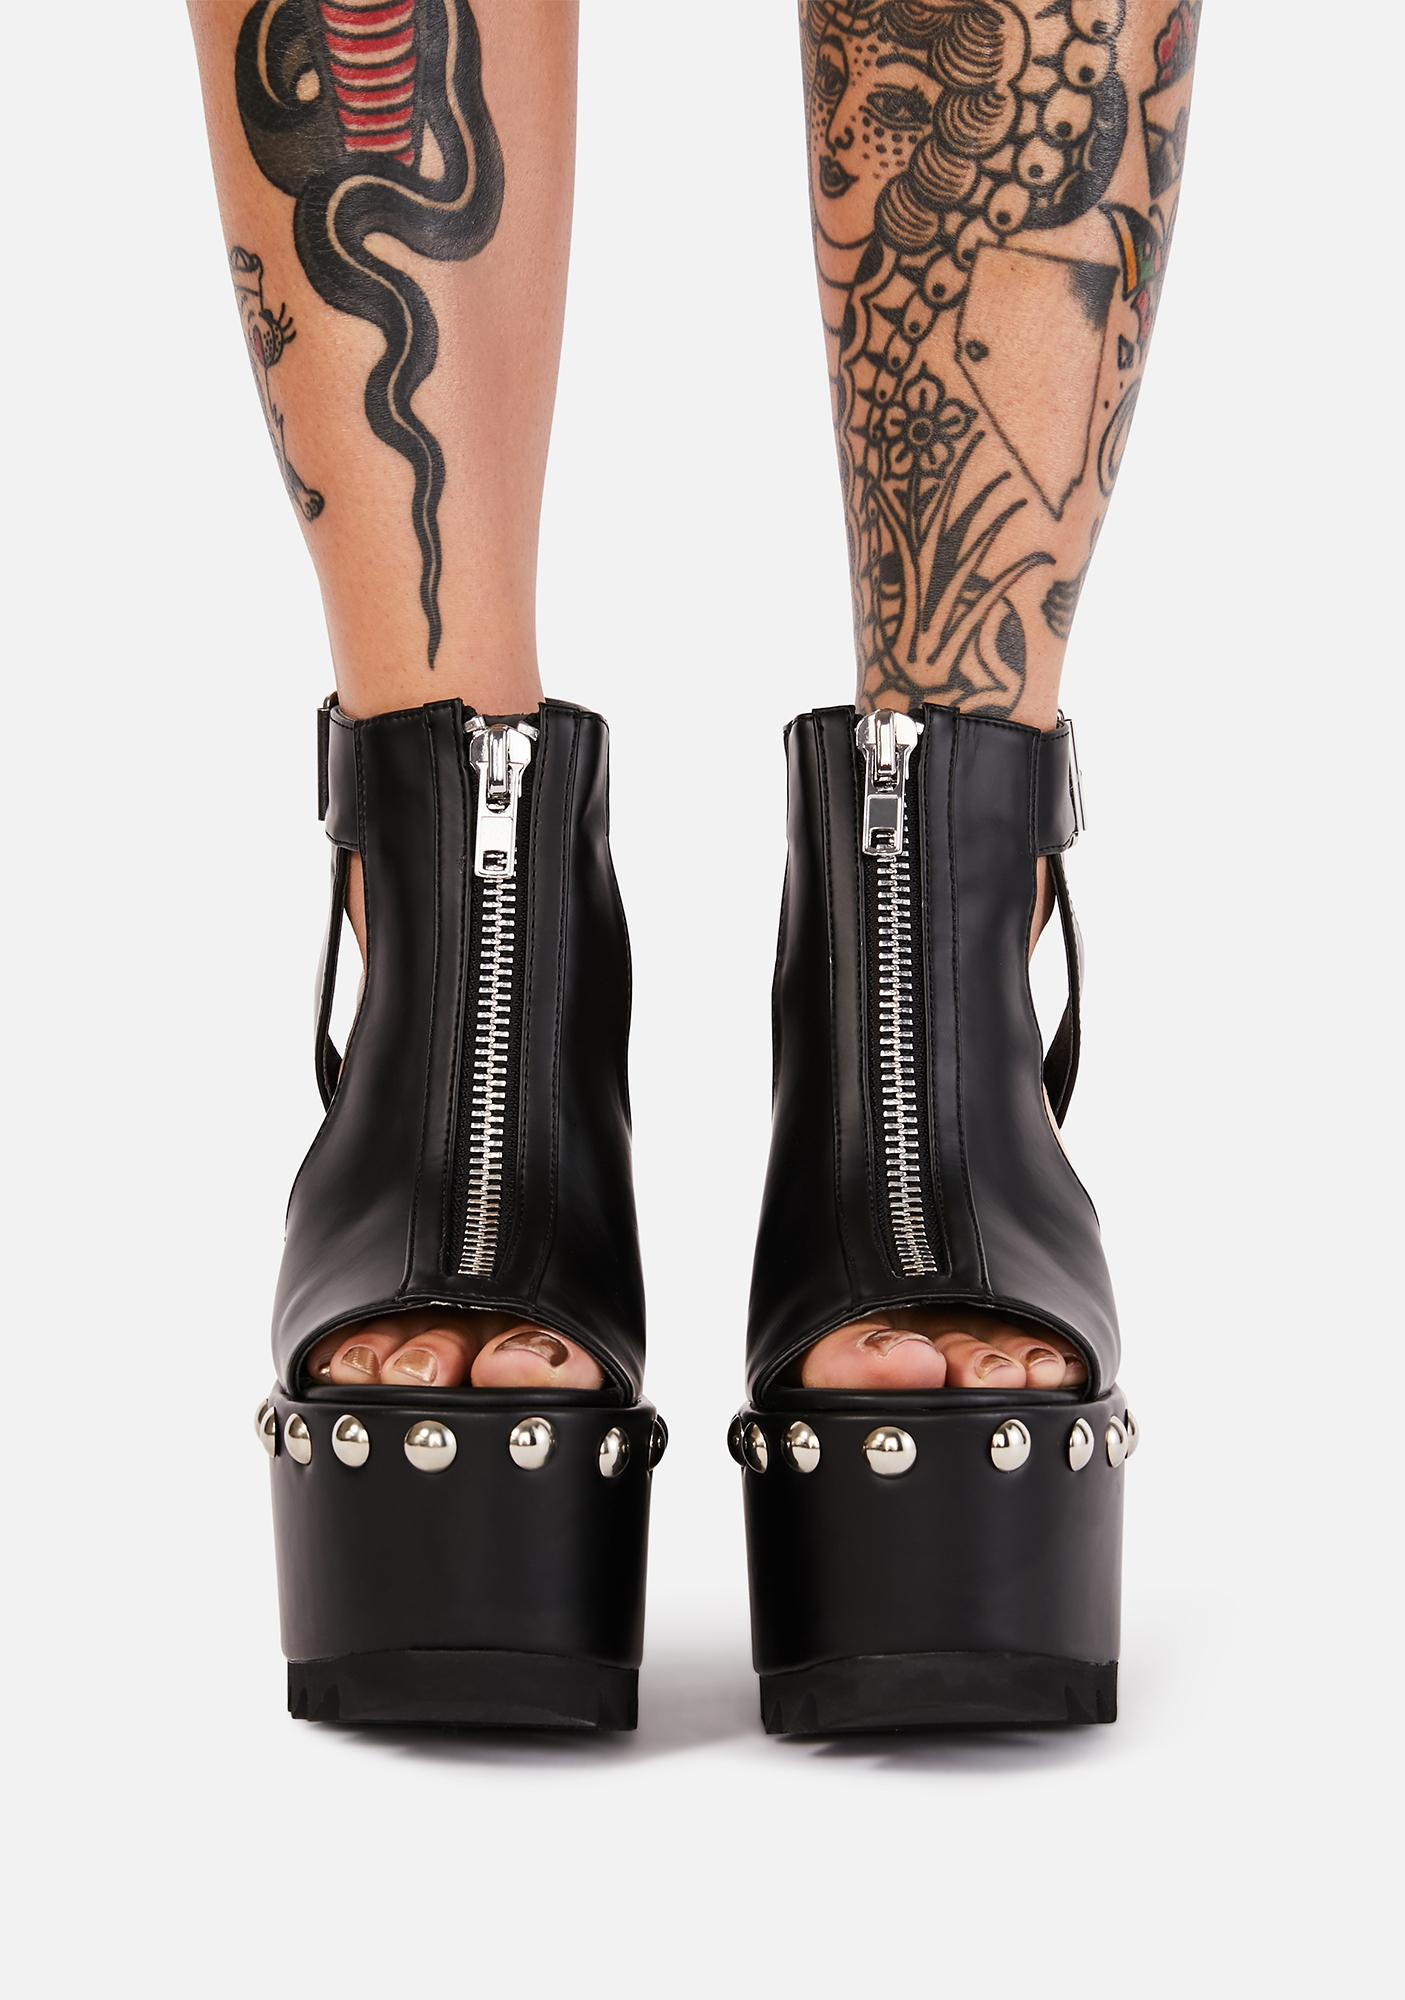 Charla Tedrick Unzipped Platform Heels